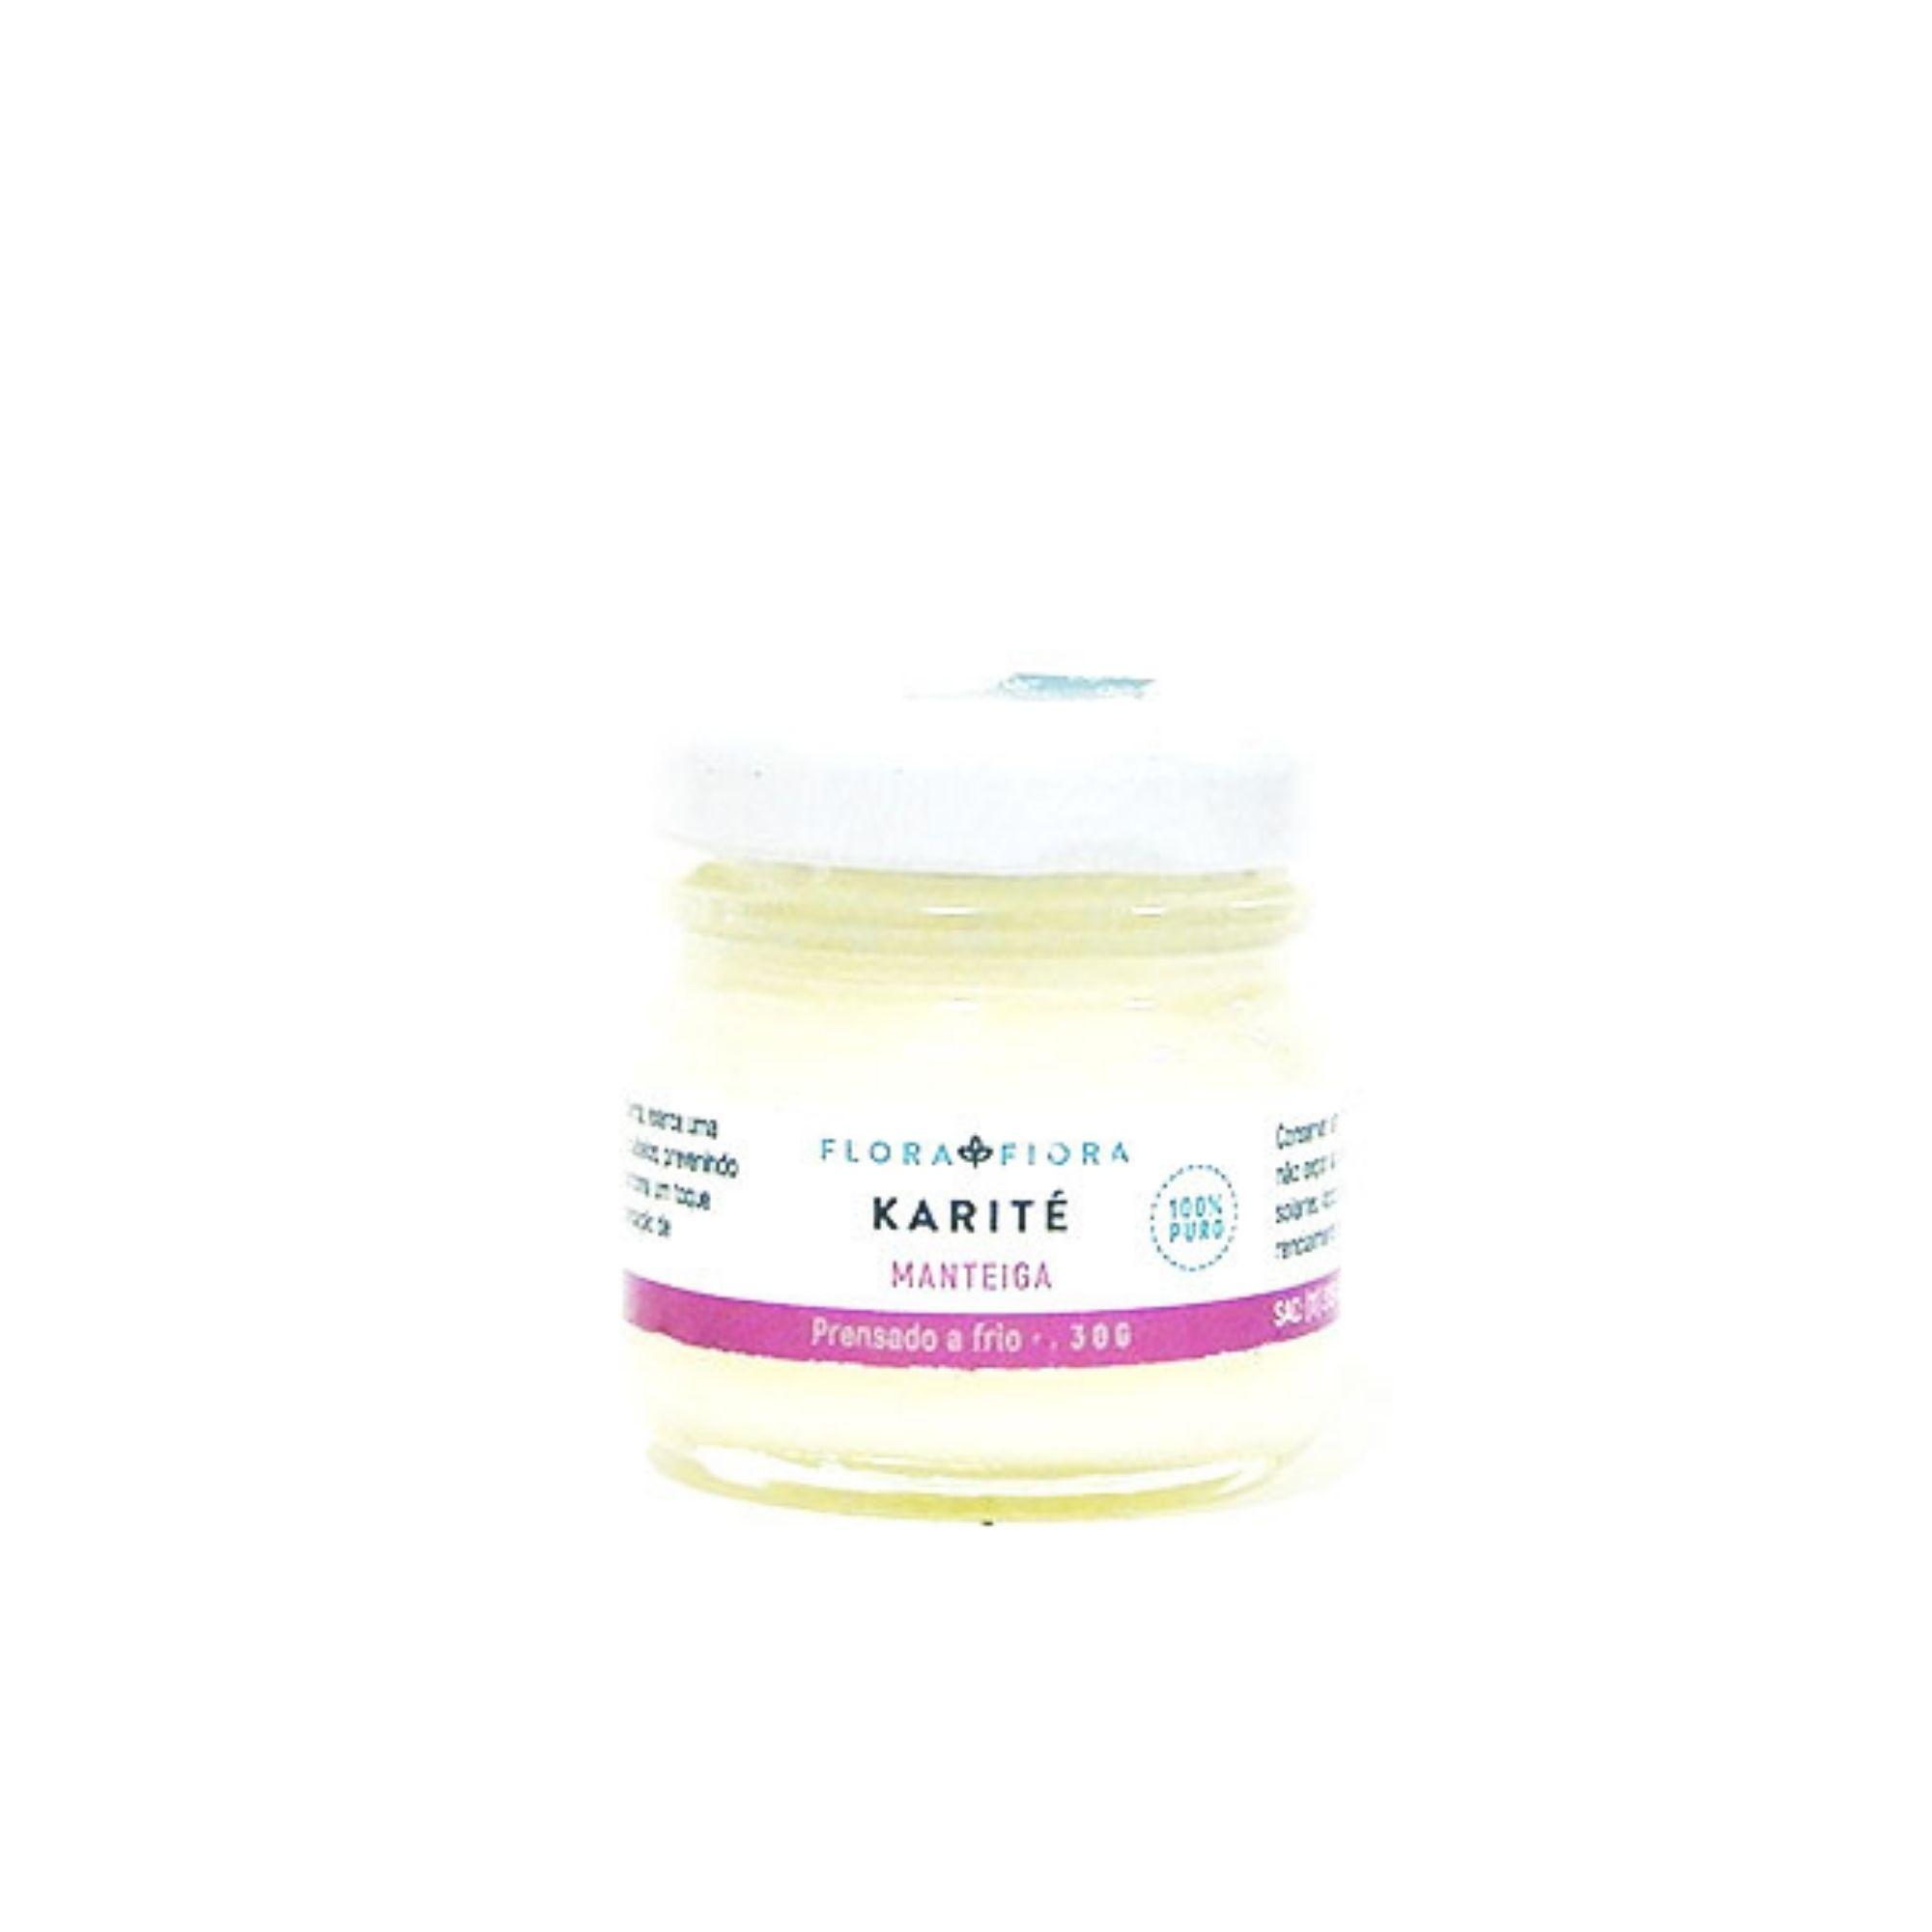 Manteiga de Karité  - Flora Fiora PRO